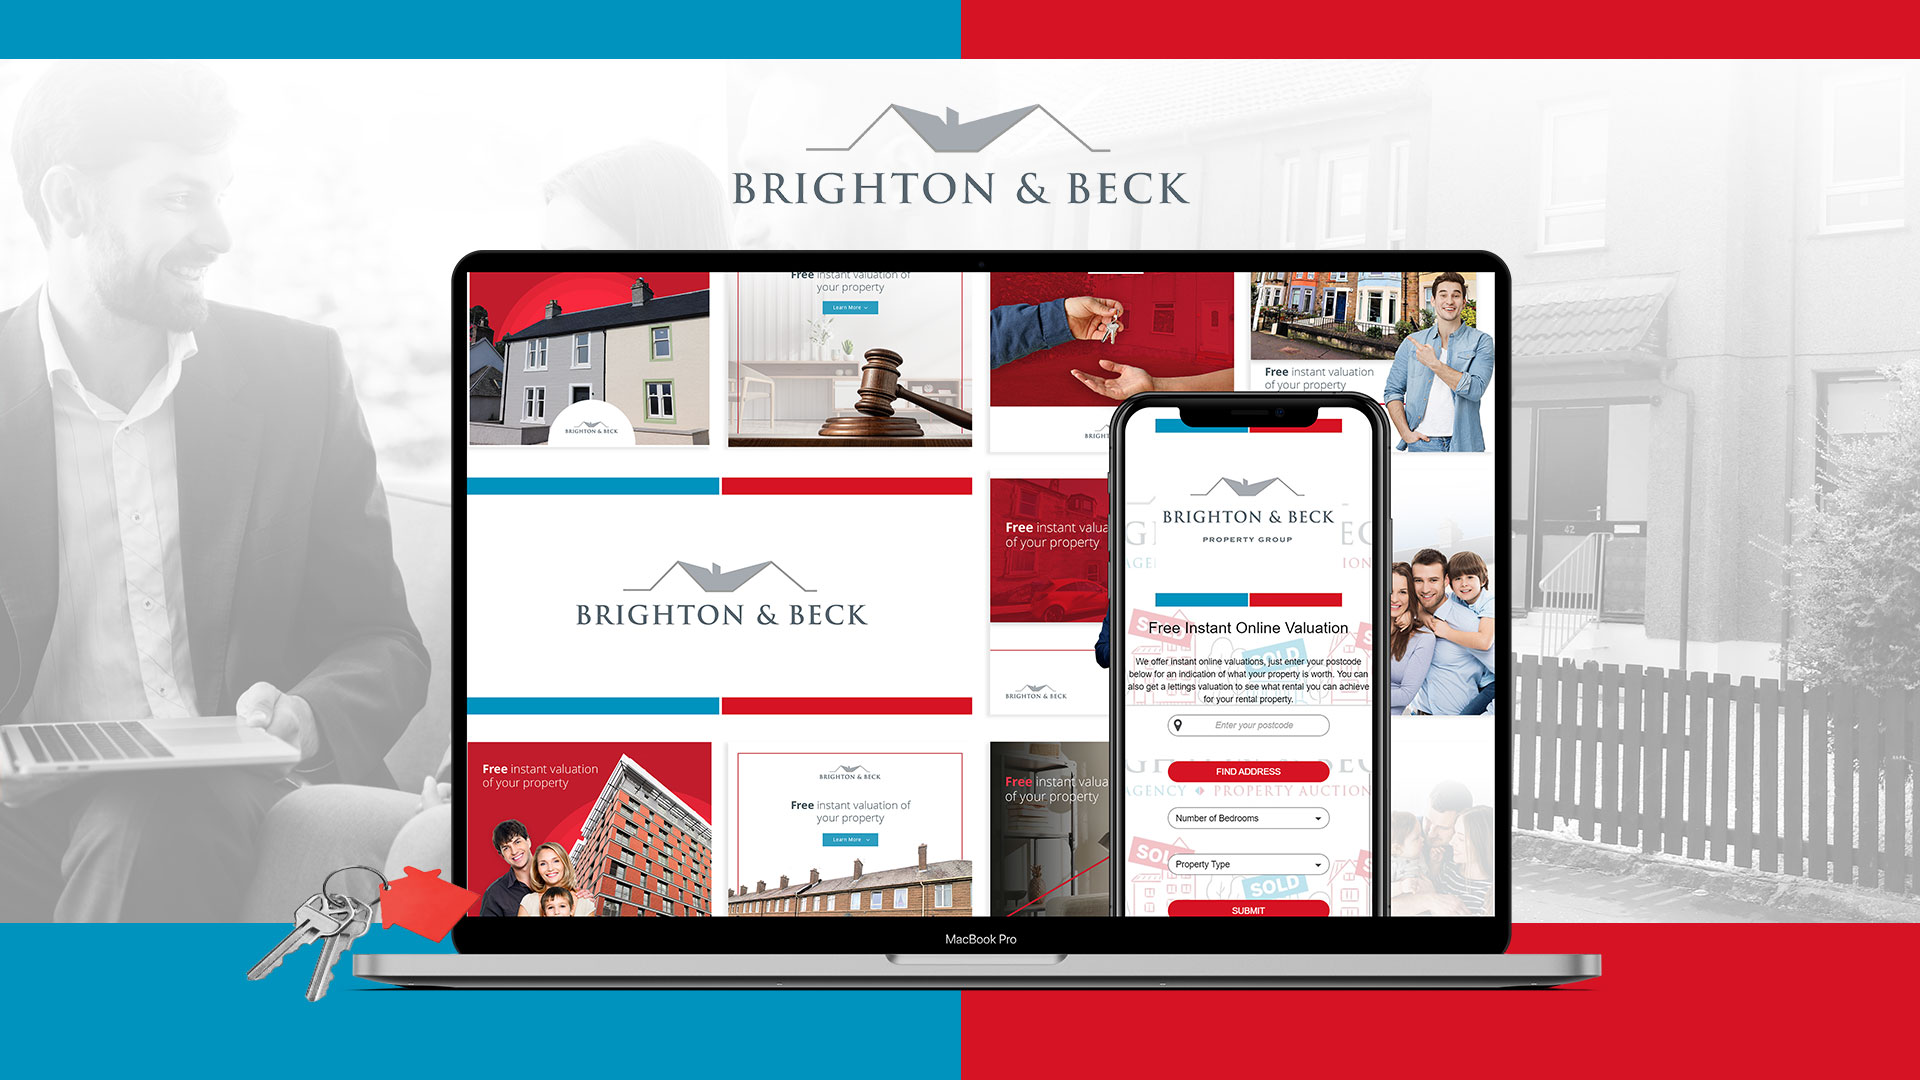 Brighton & Beck